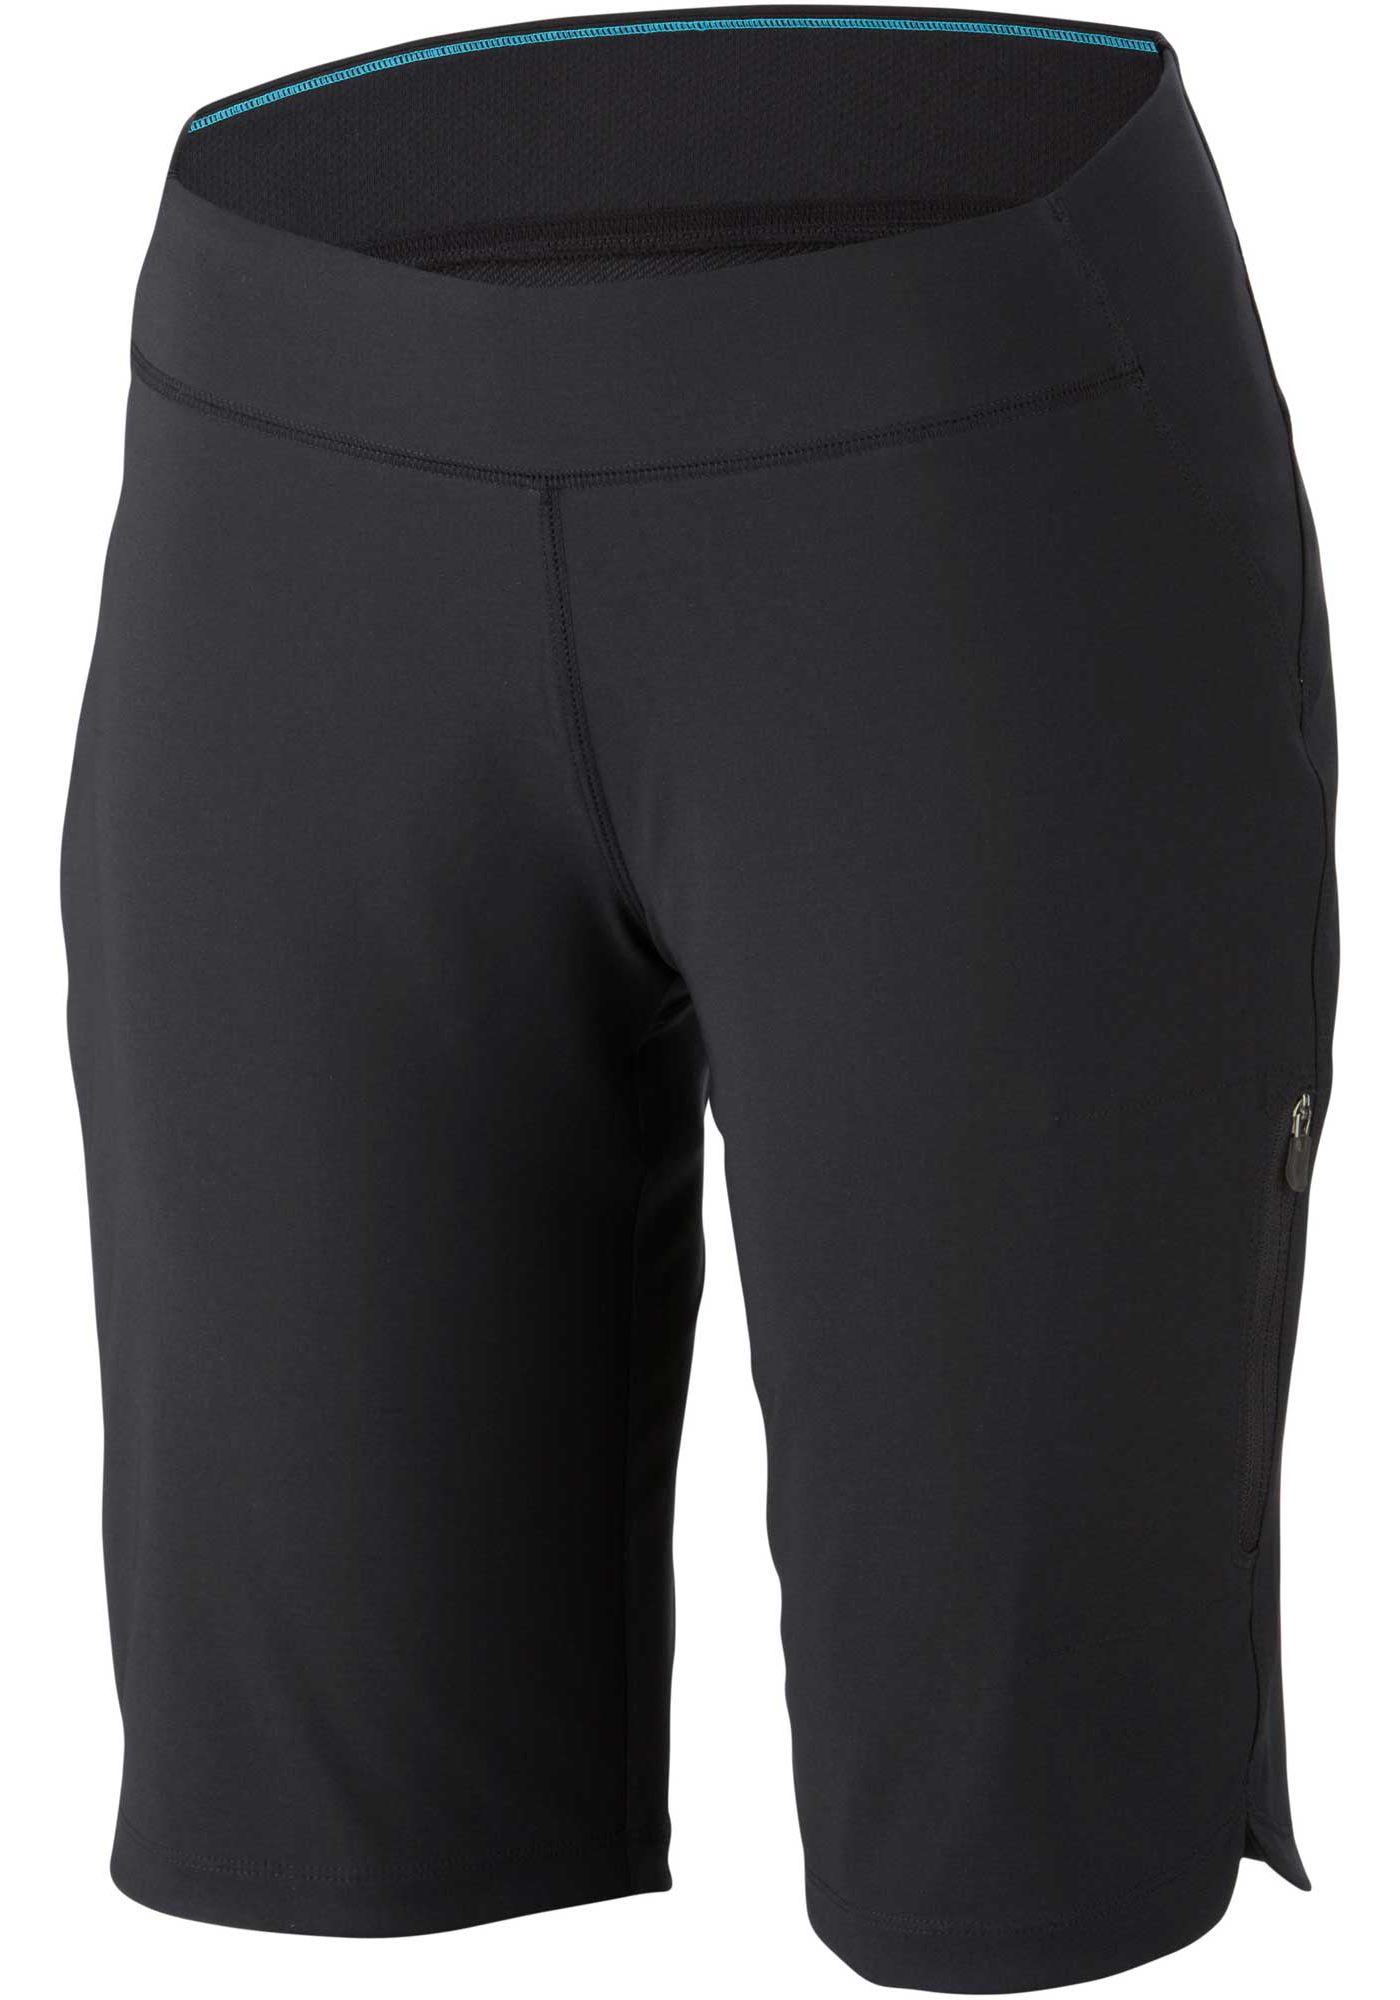 Columbia Women's Back Beauty Long Sport Shorts